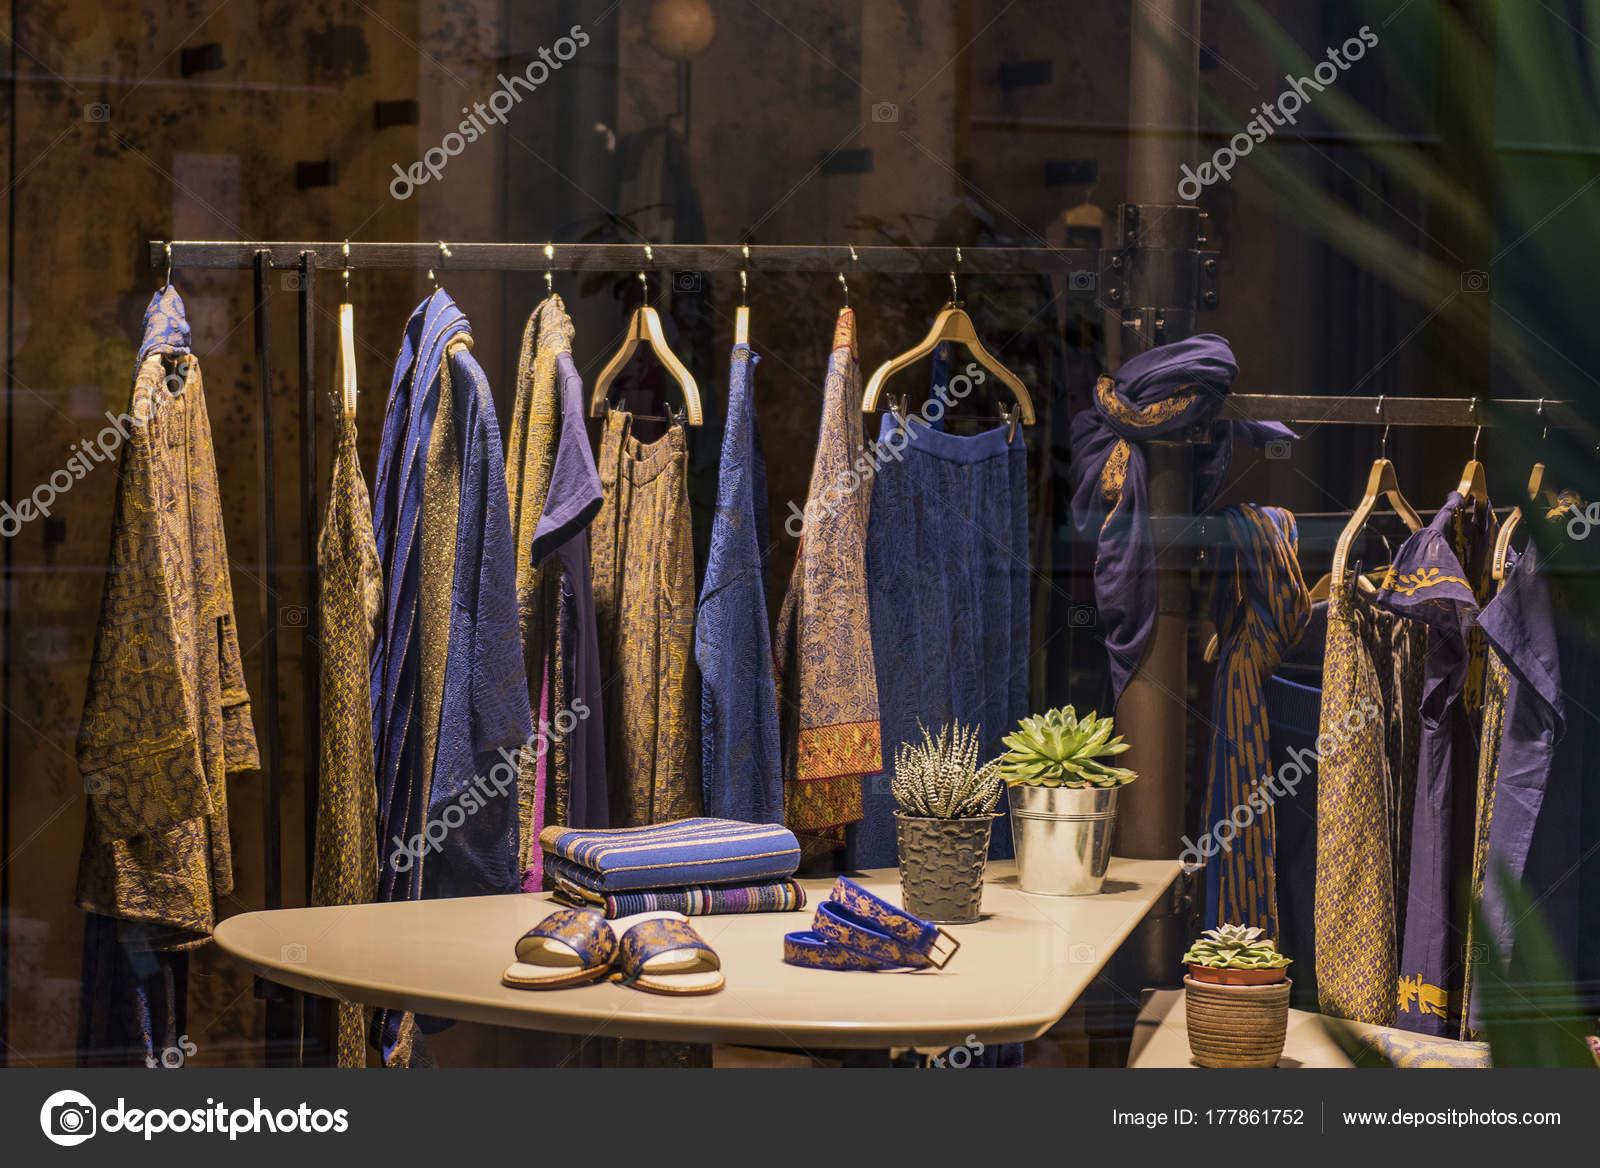 5ff33f87ebece Paris Kadın Giyim Mağaza — Stok Foto © AGCreativeLab #177861752